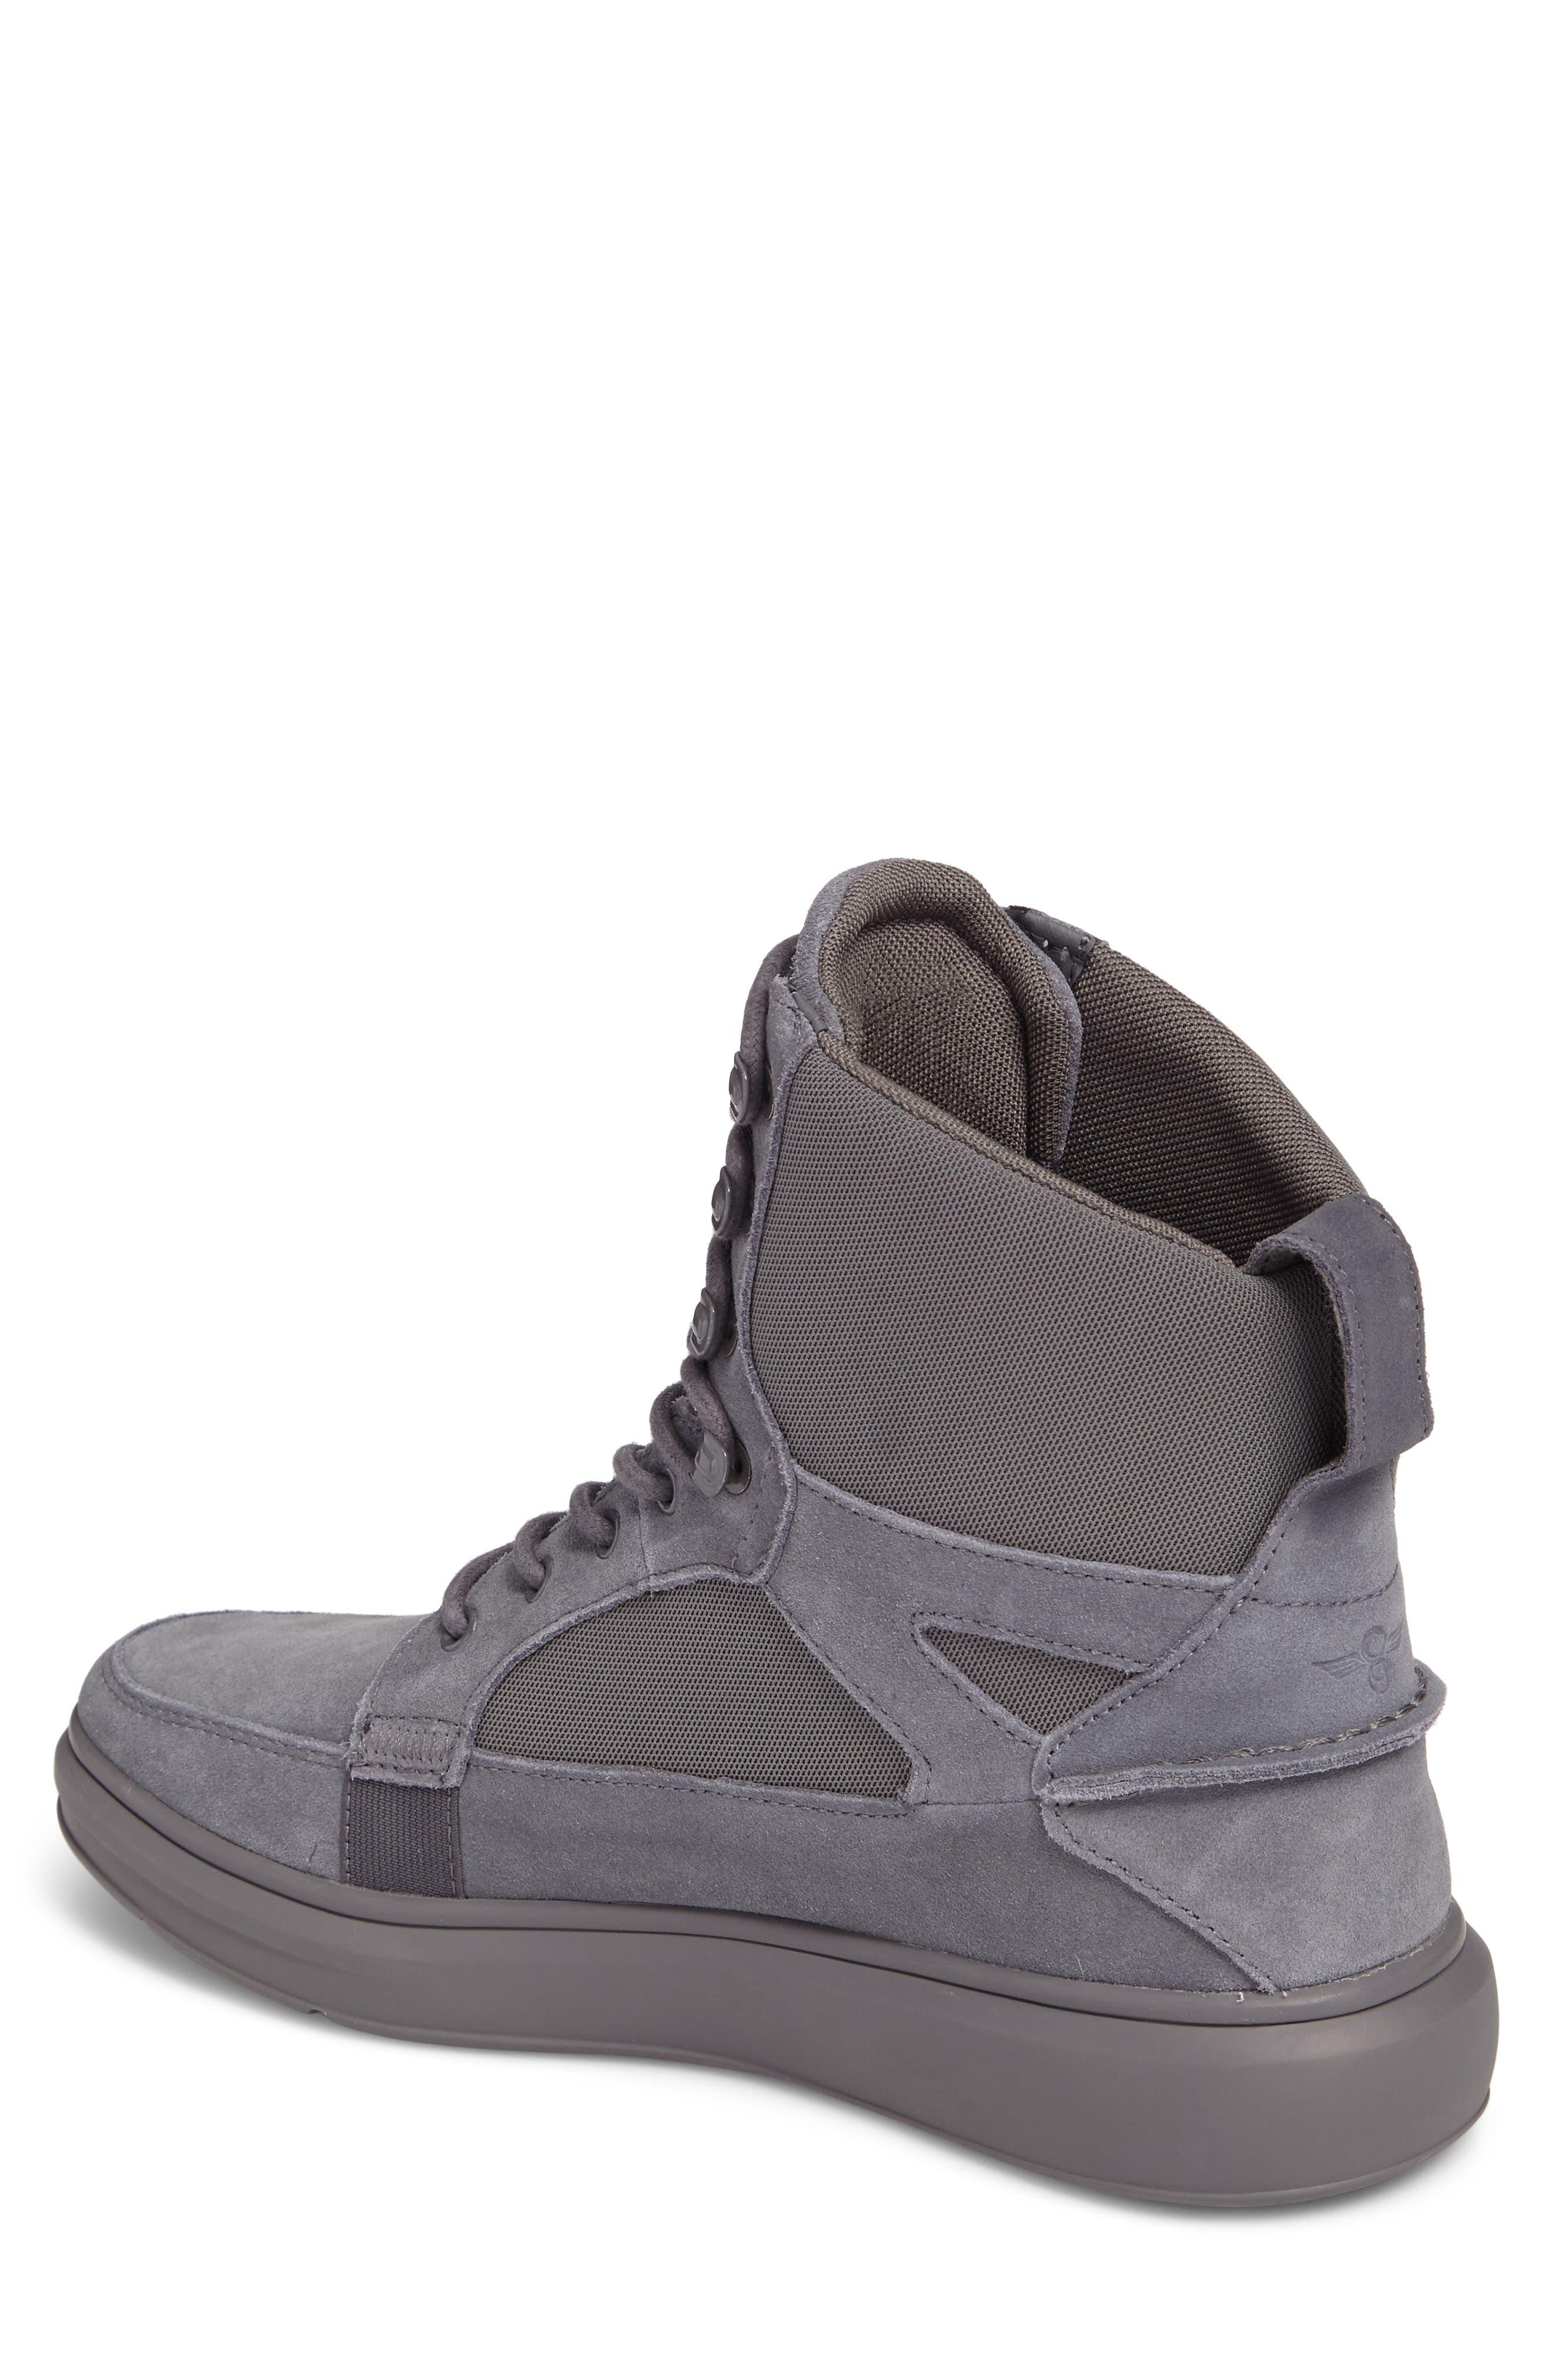 Desimo Sneaker,                             Alternate thumbnail 2, color,                             032